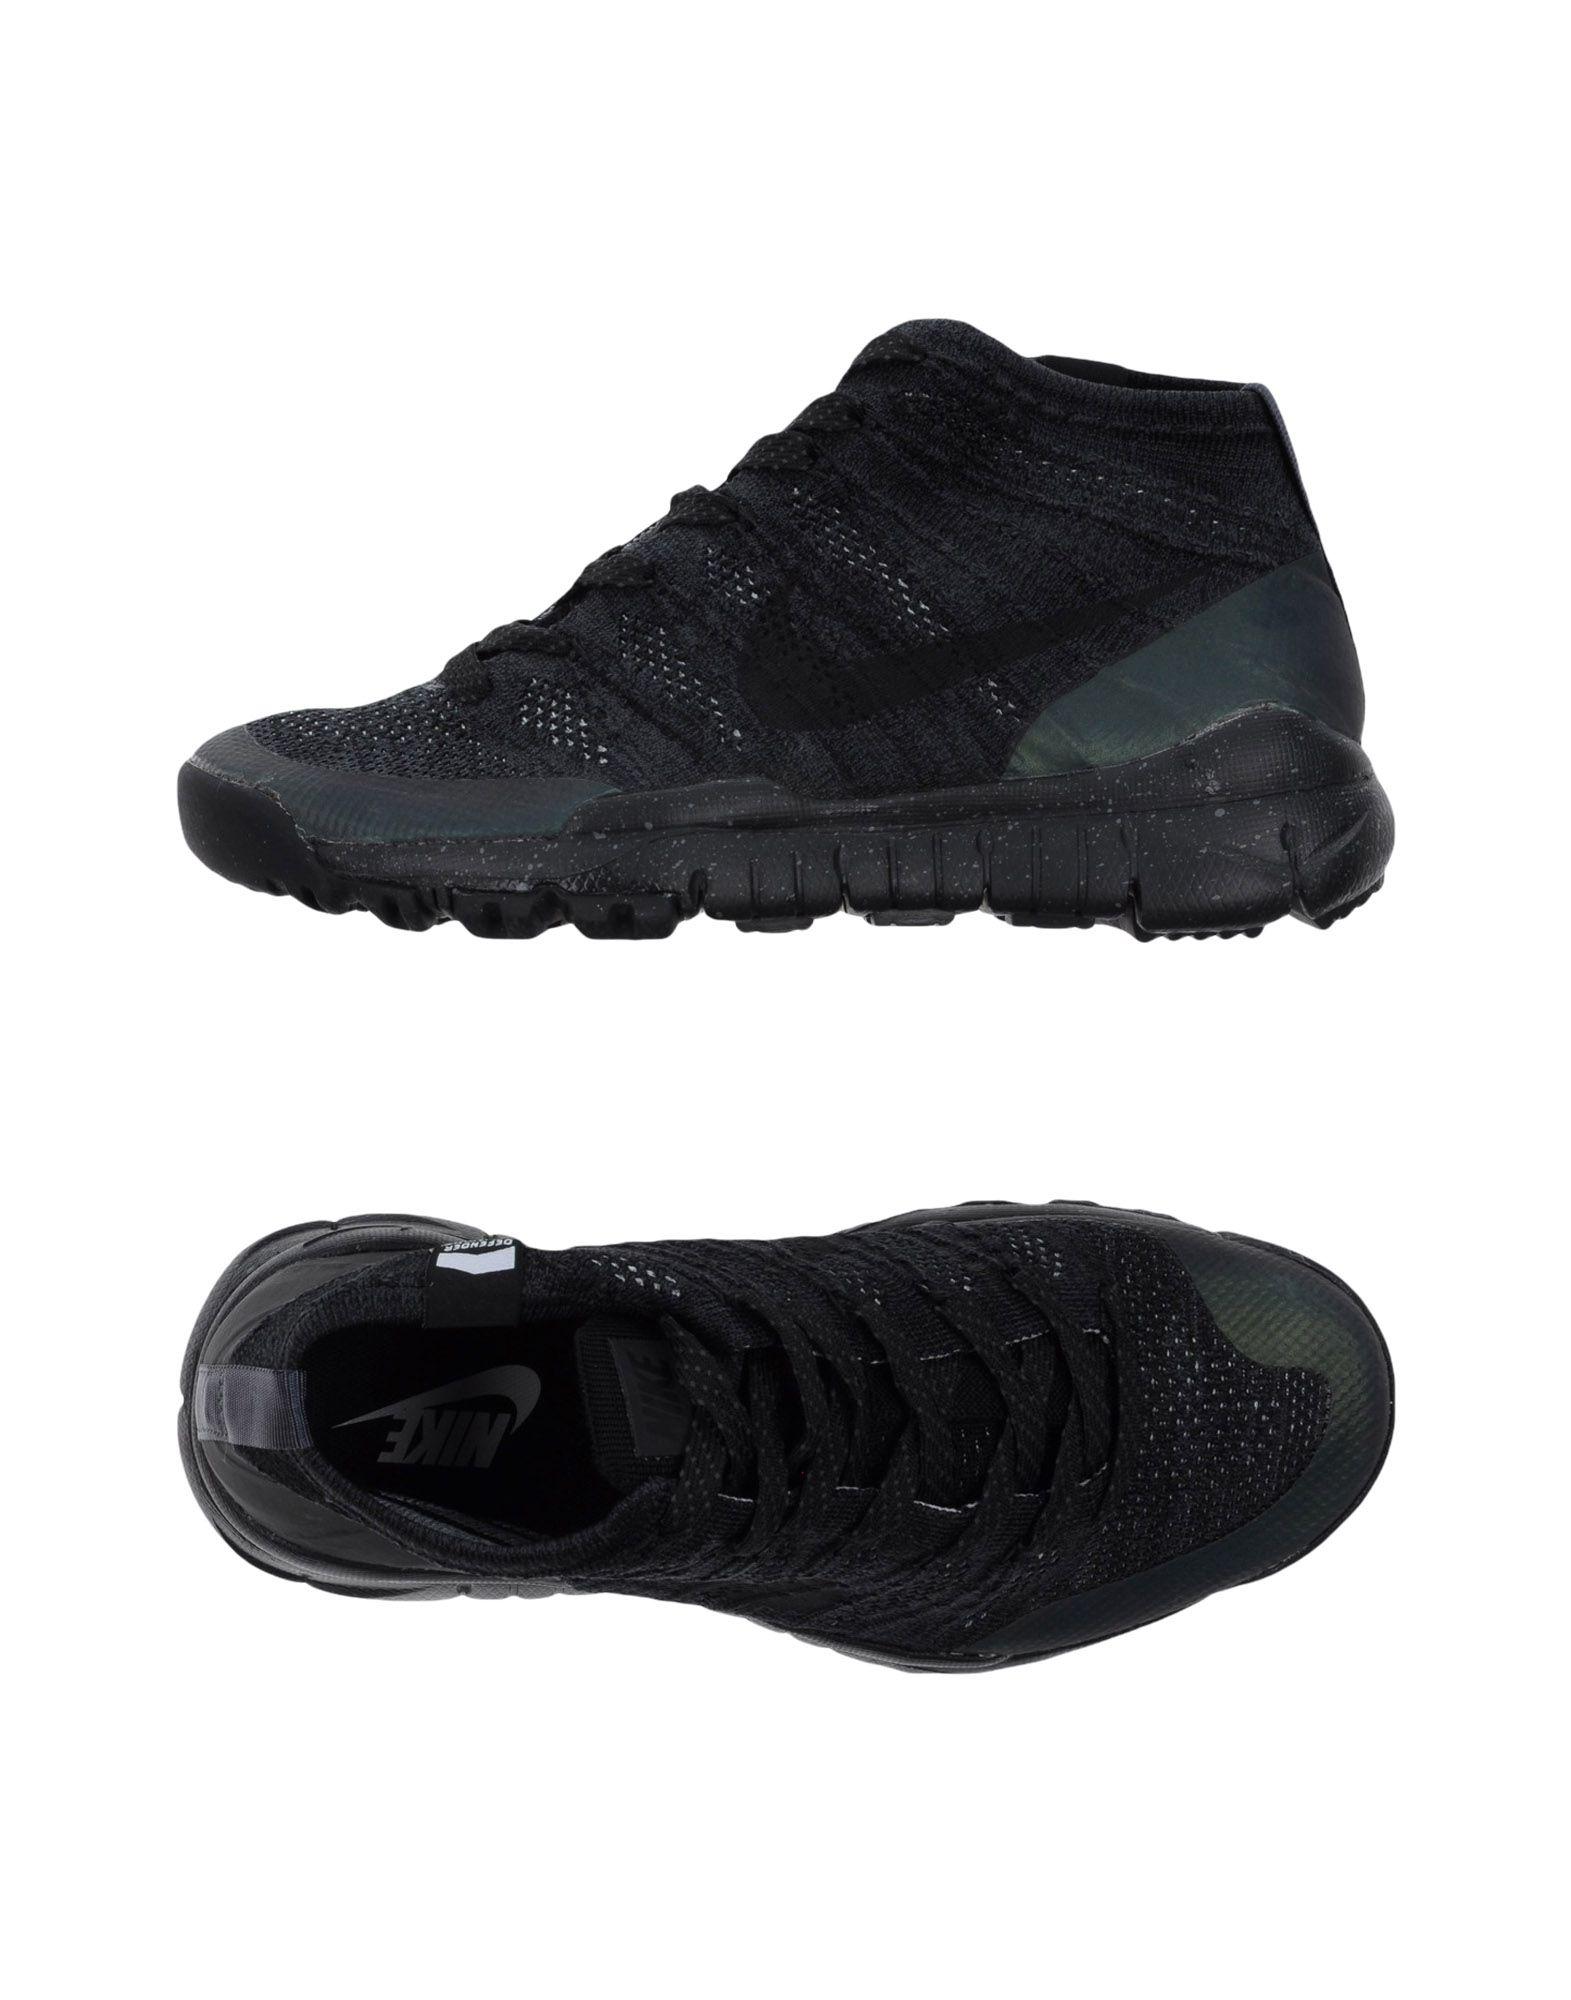 Zapatillas Nike Mujer - Zapatillas Nike  Negro Negro  3e872a